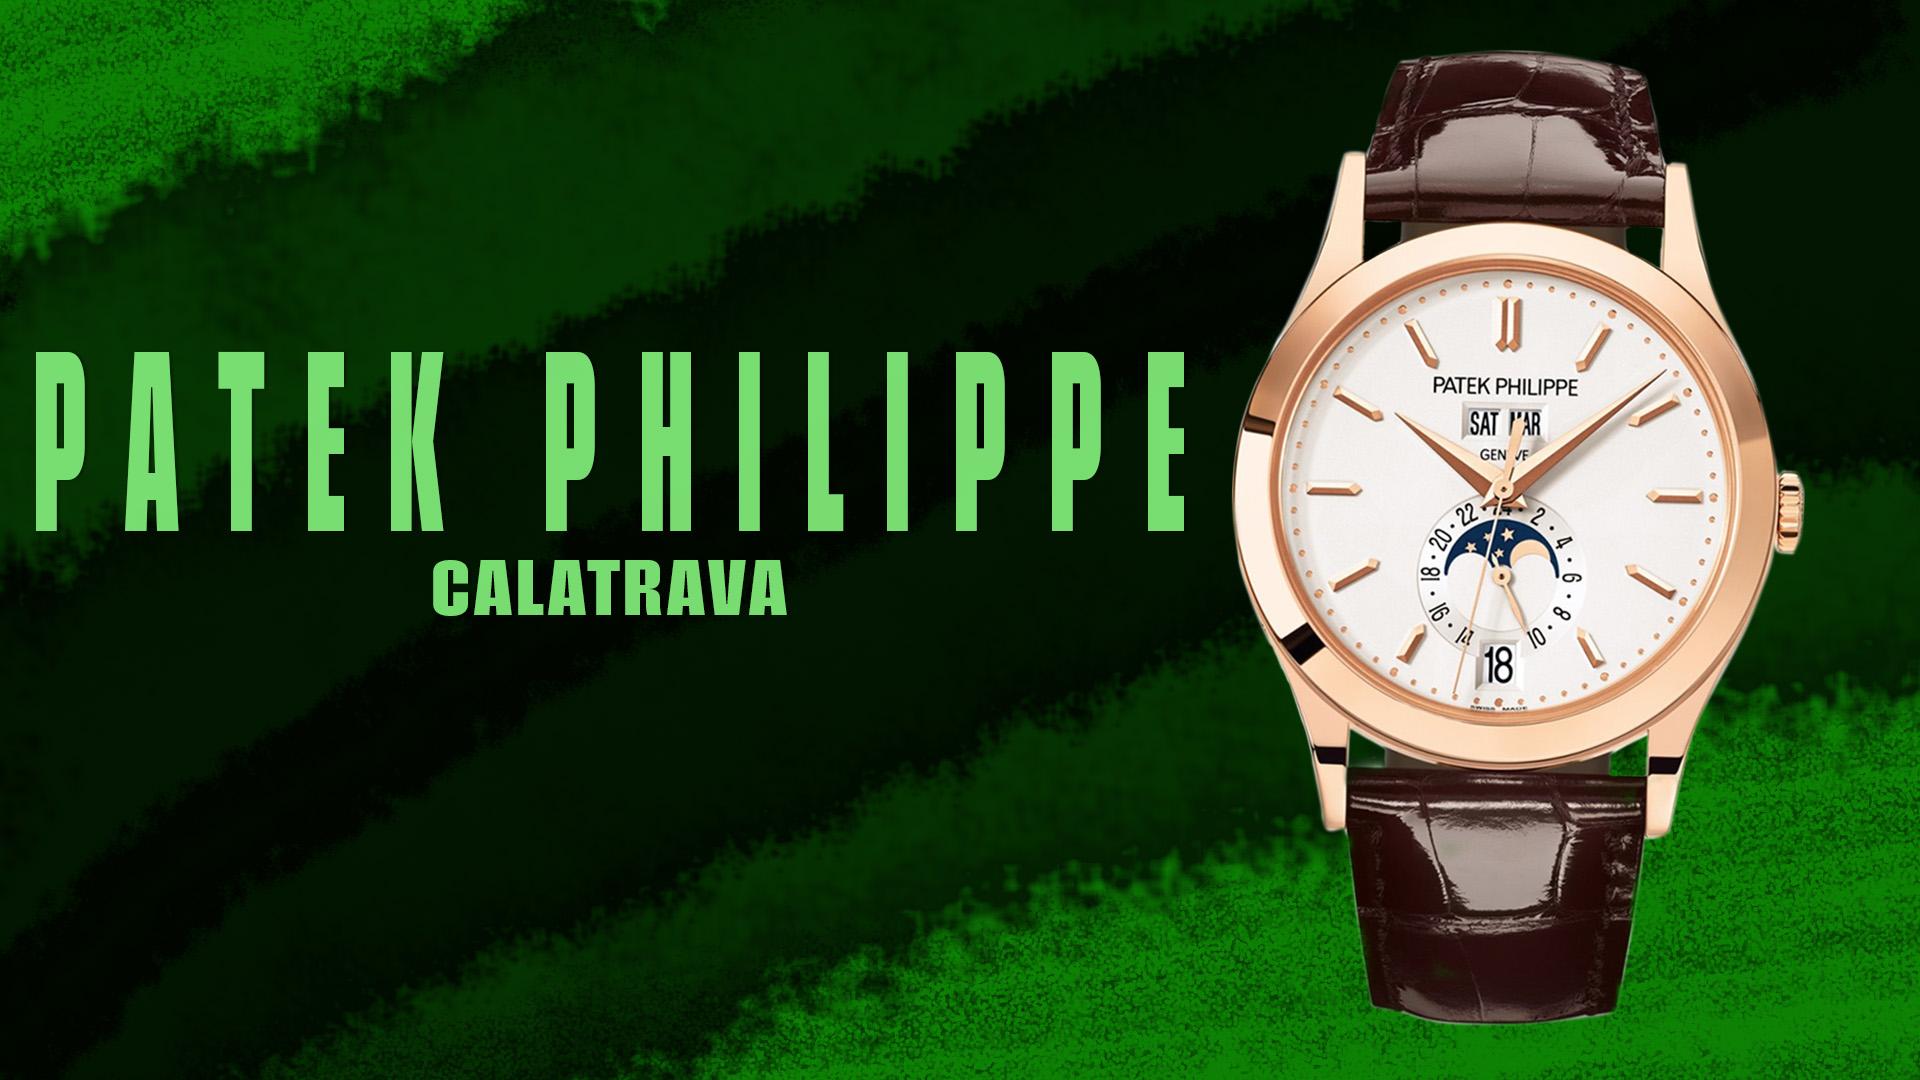 WatchBox - Patek Philippe Calatrava